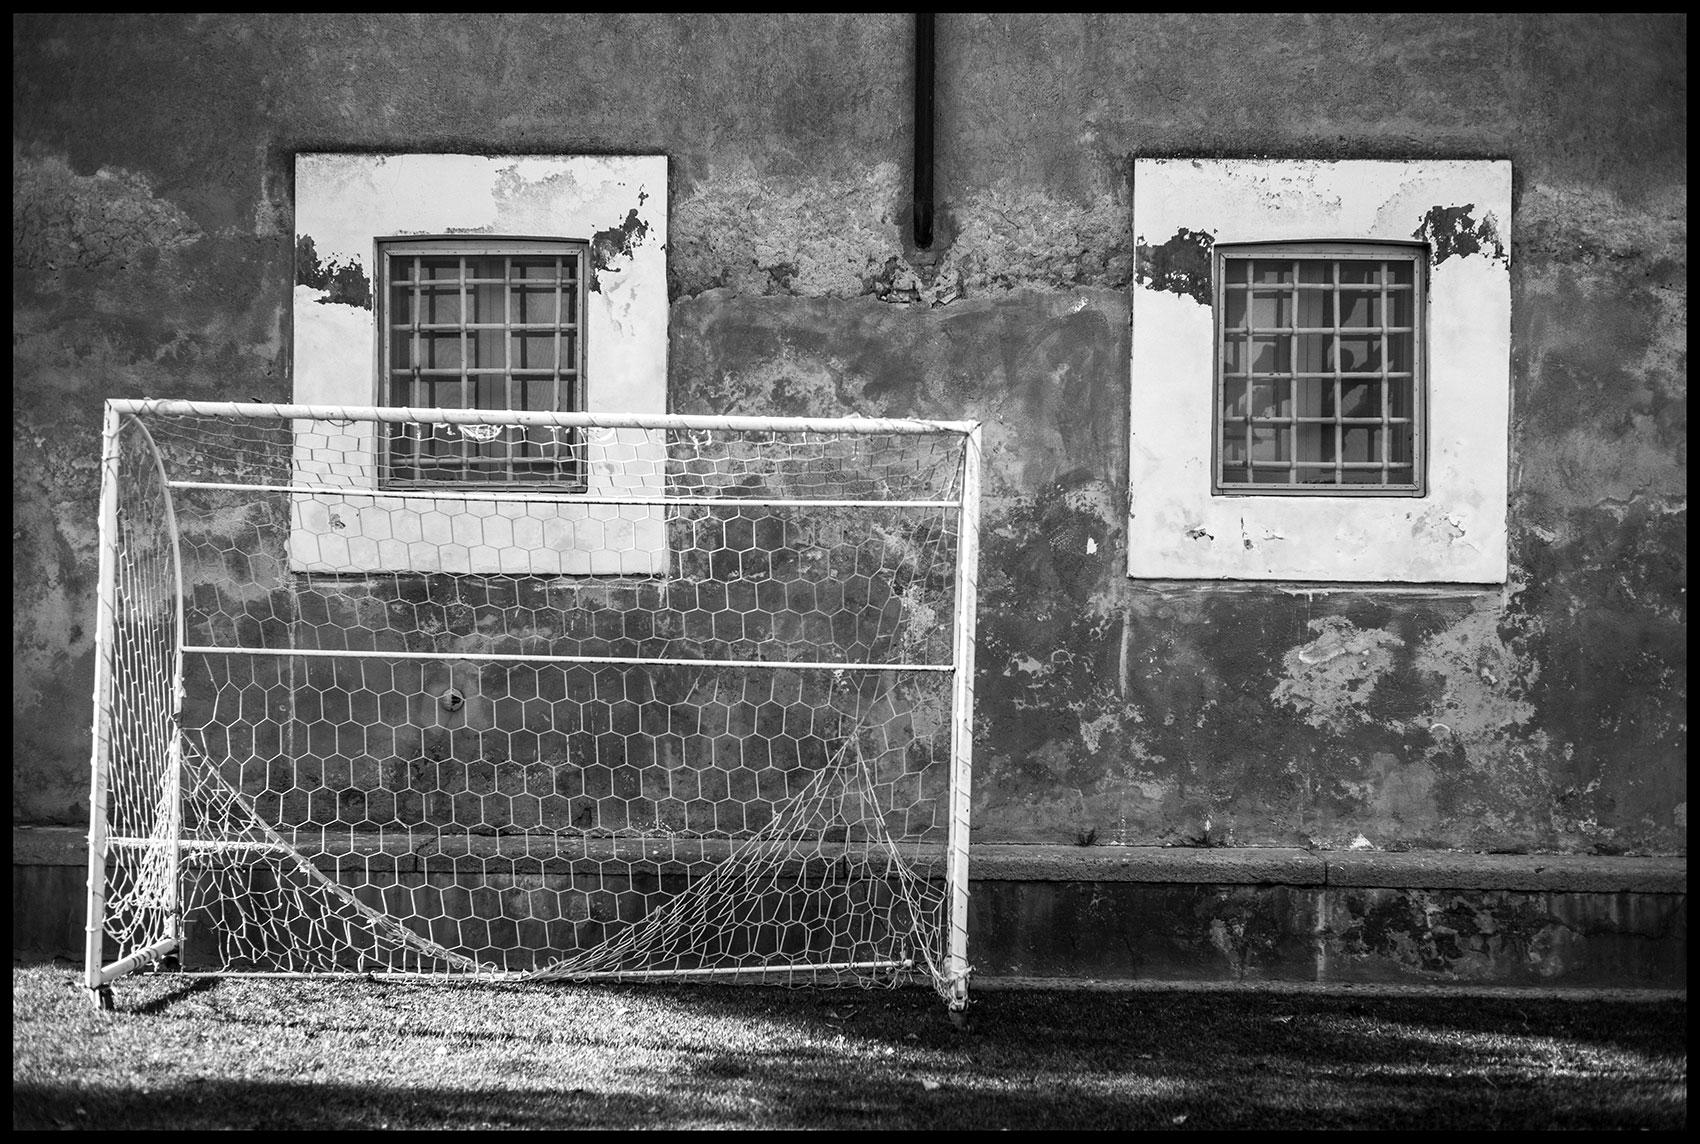 Campo Deserto 3 | Album QUARANTINE | Stefano Paradiso - Photographer